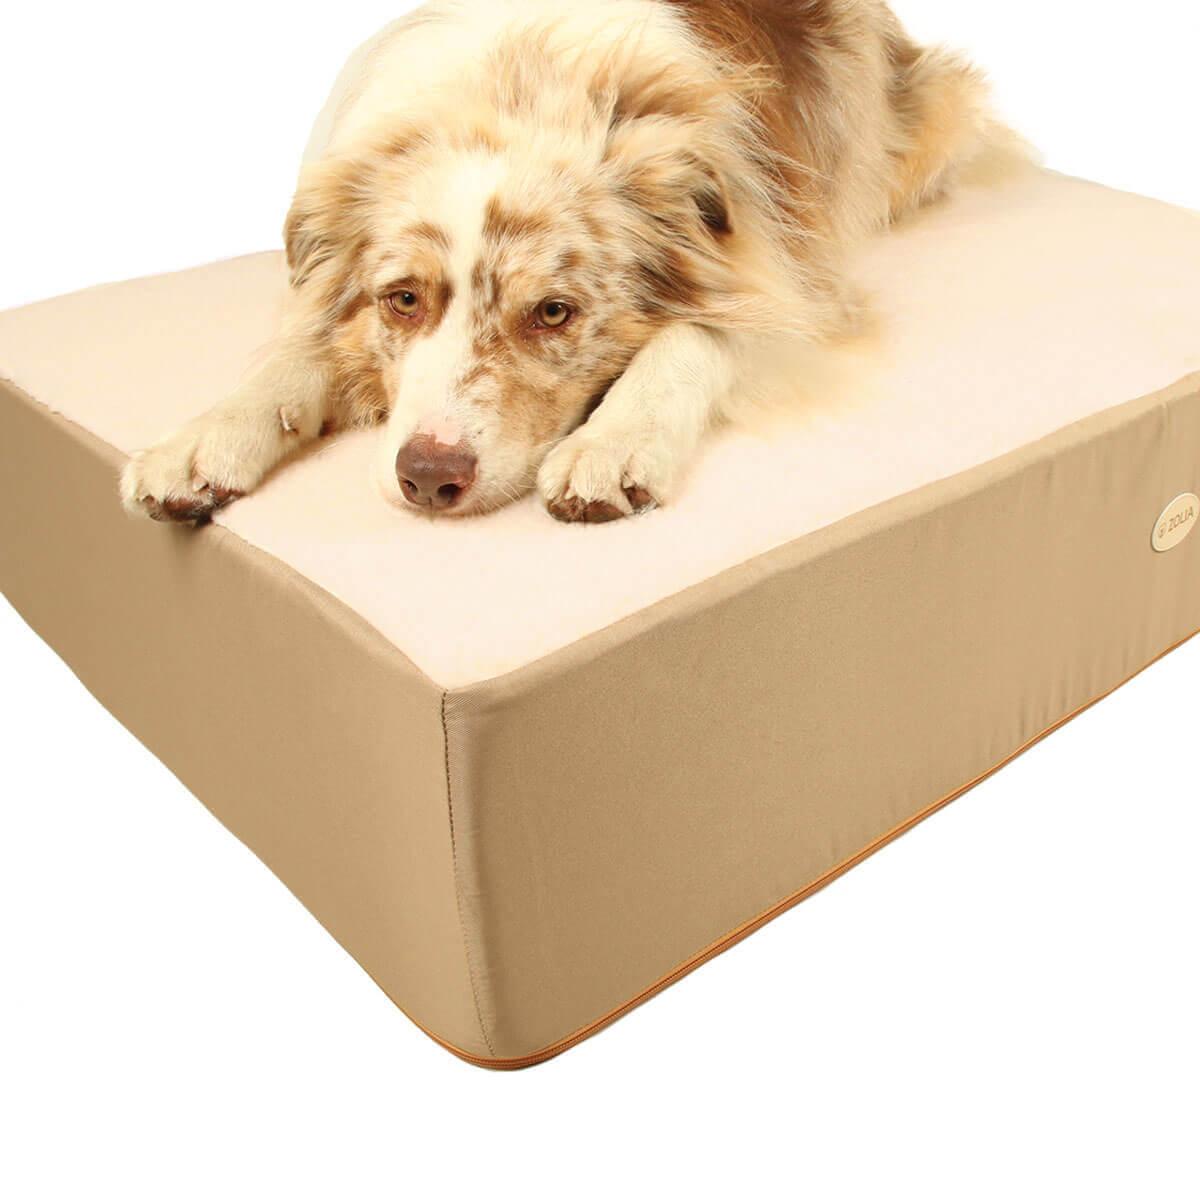 Cochón ZOLIA NAYA 110 cm Maxi espesor para perros_5